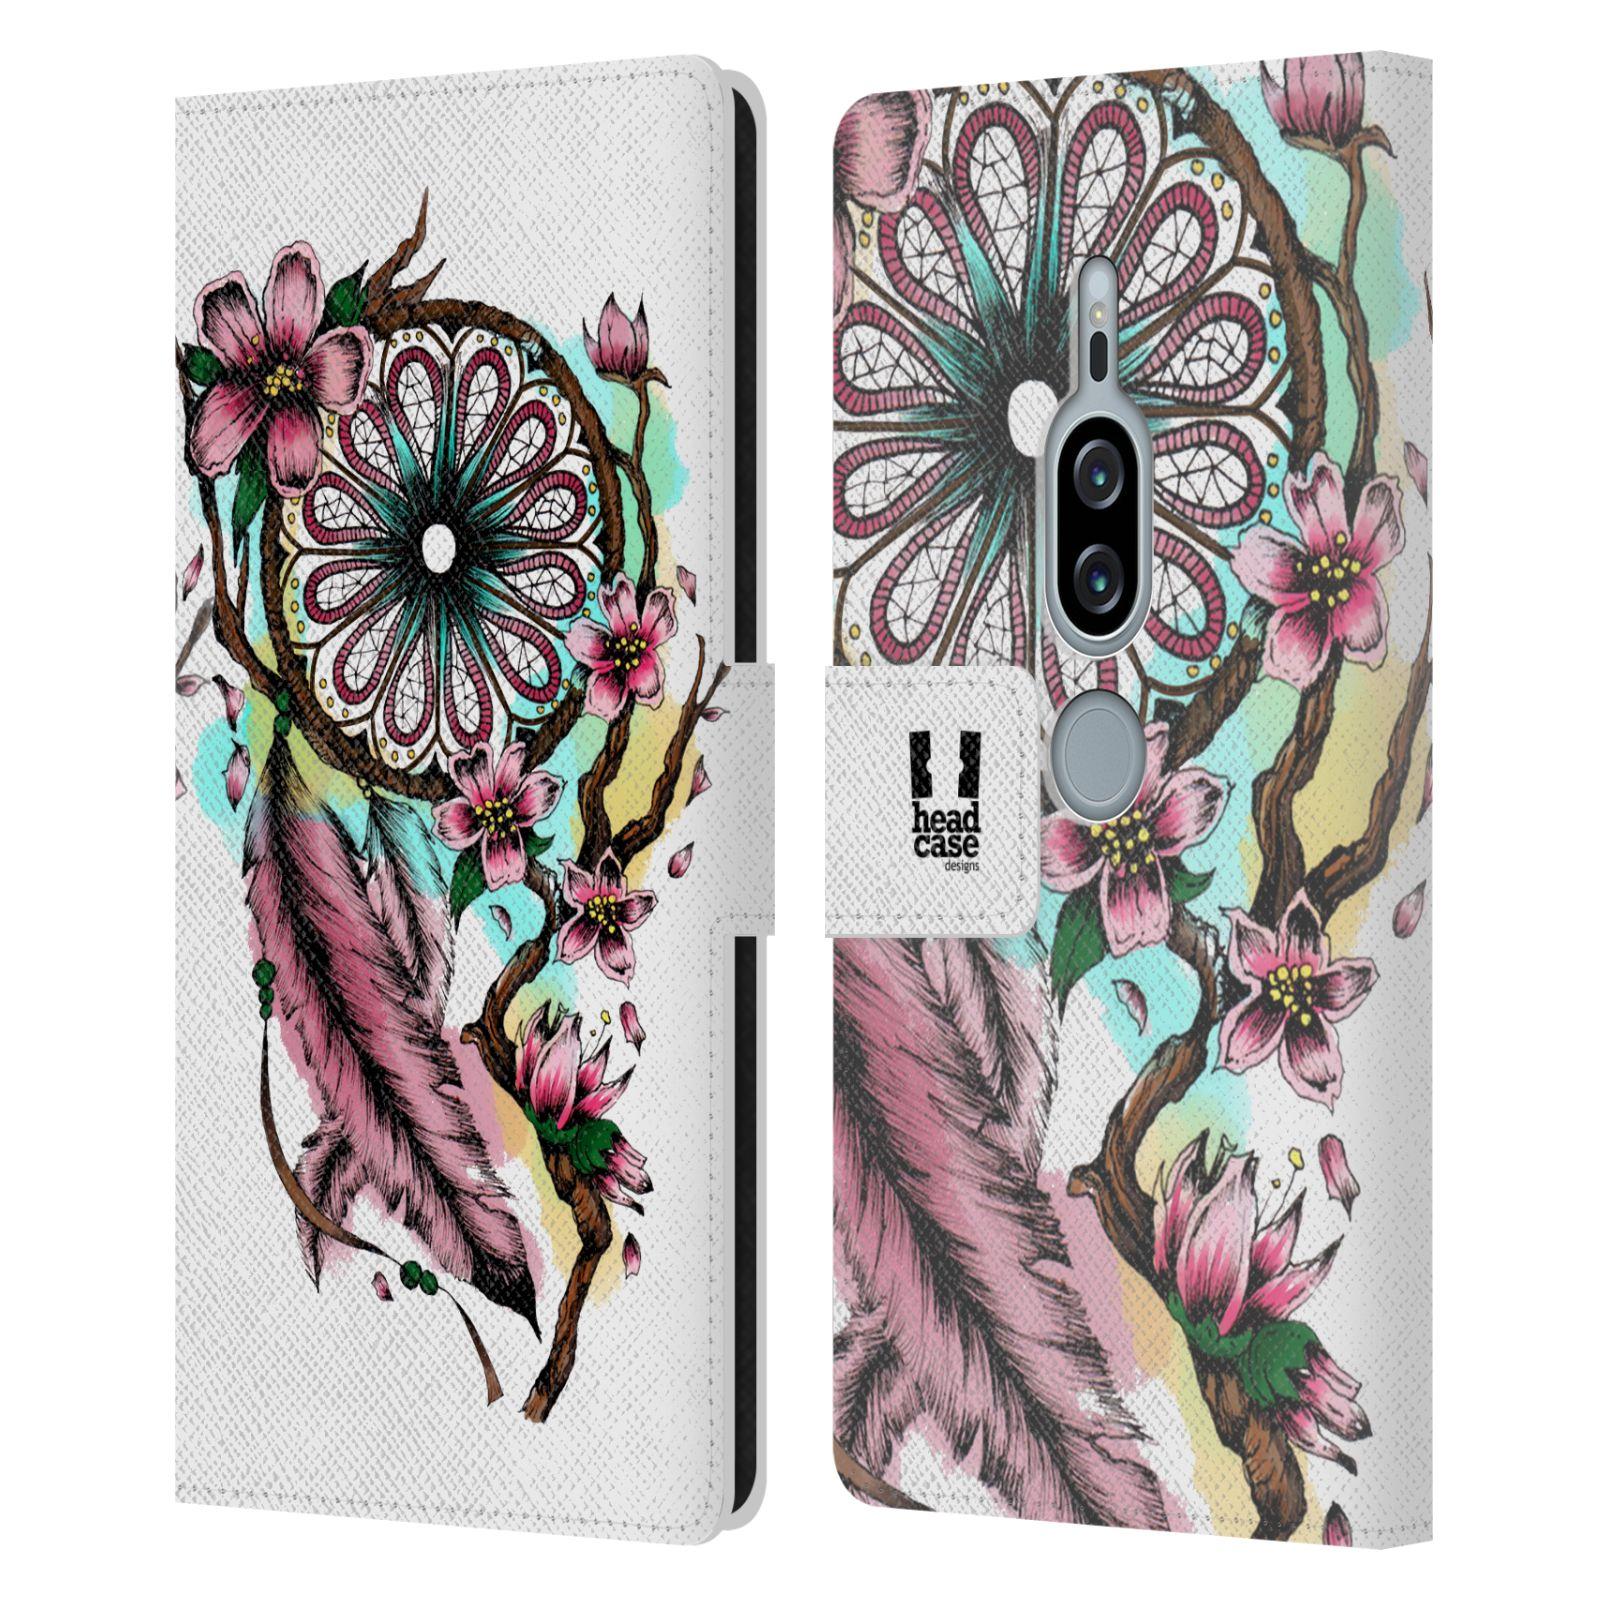 Pouzdro na mobil Sony Xperia XZ2 Premium - Head Case - Lapač snů květy fialová